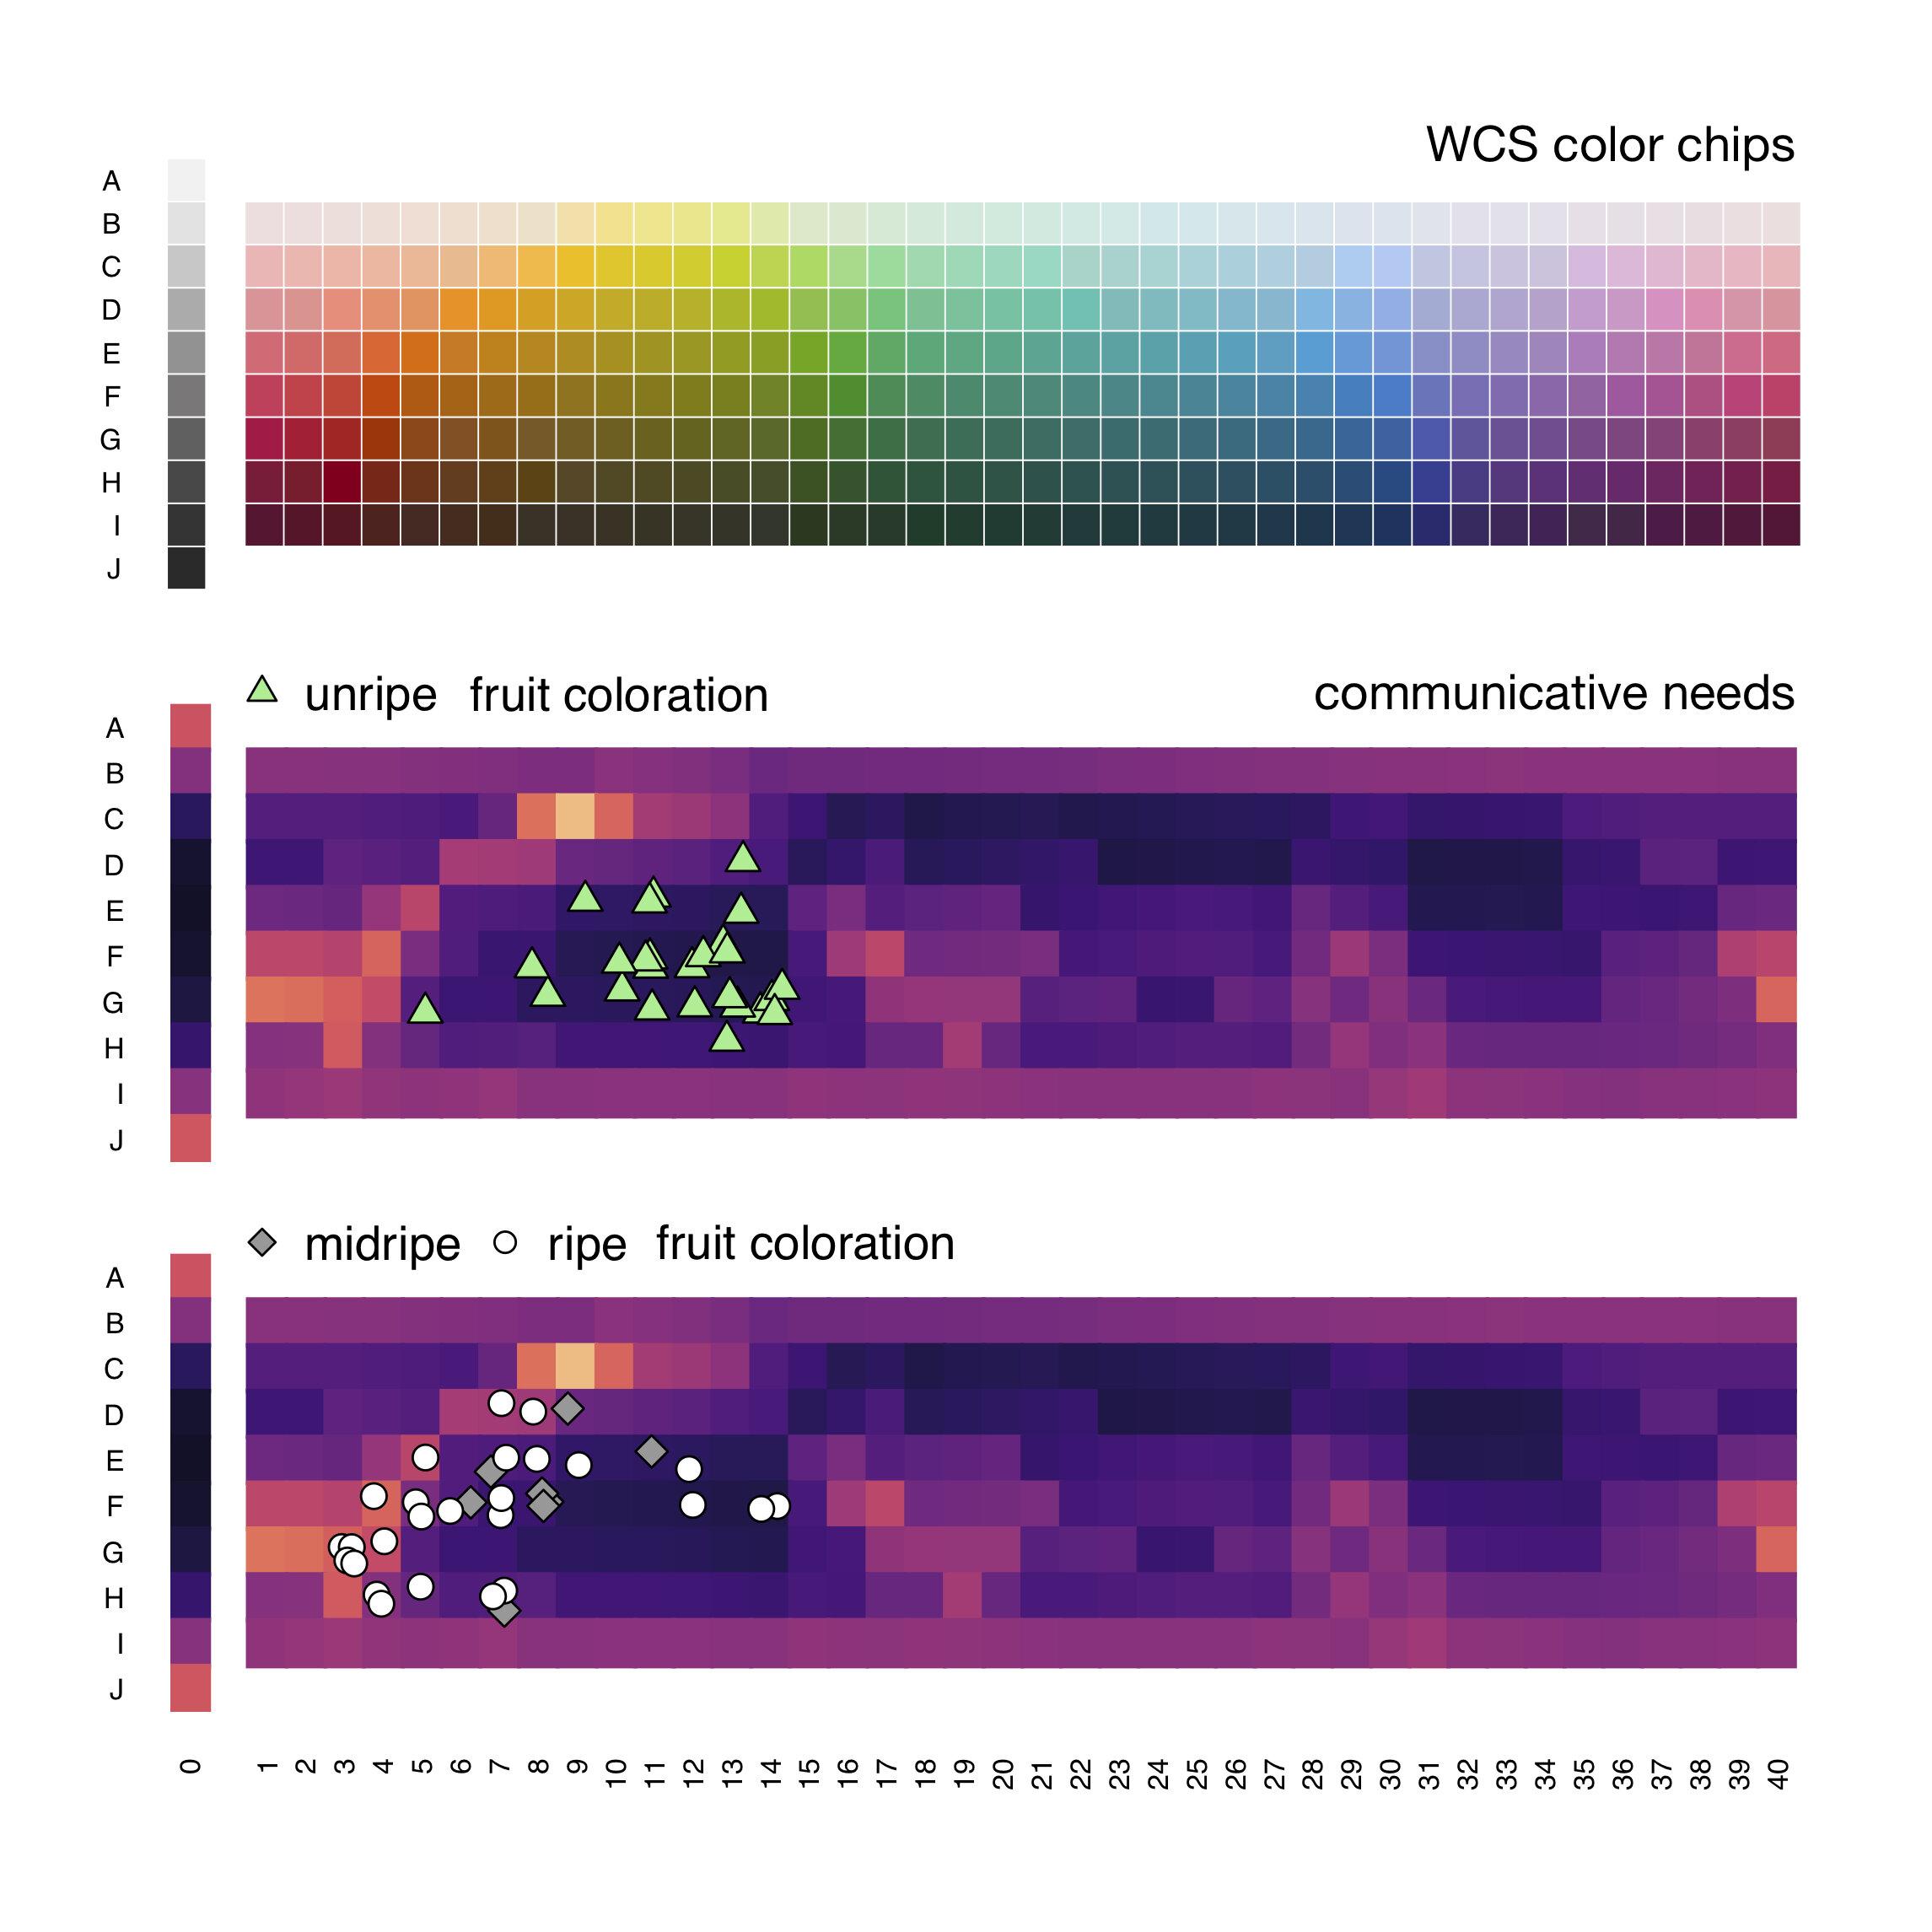 Researchers develop algorithm to map words to colors across languages